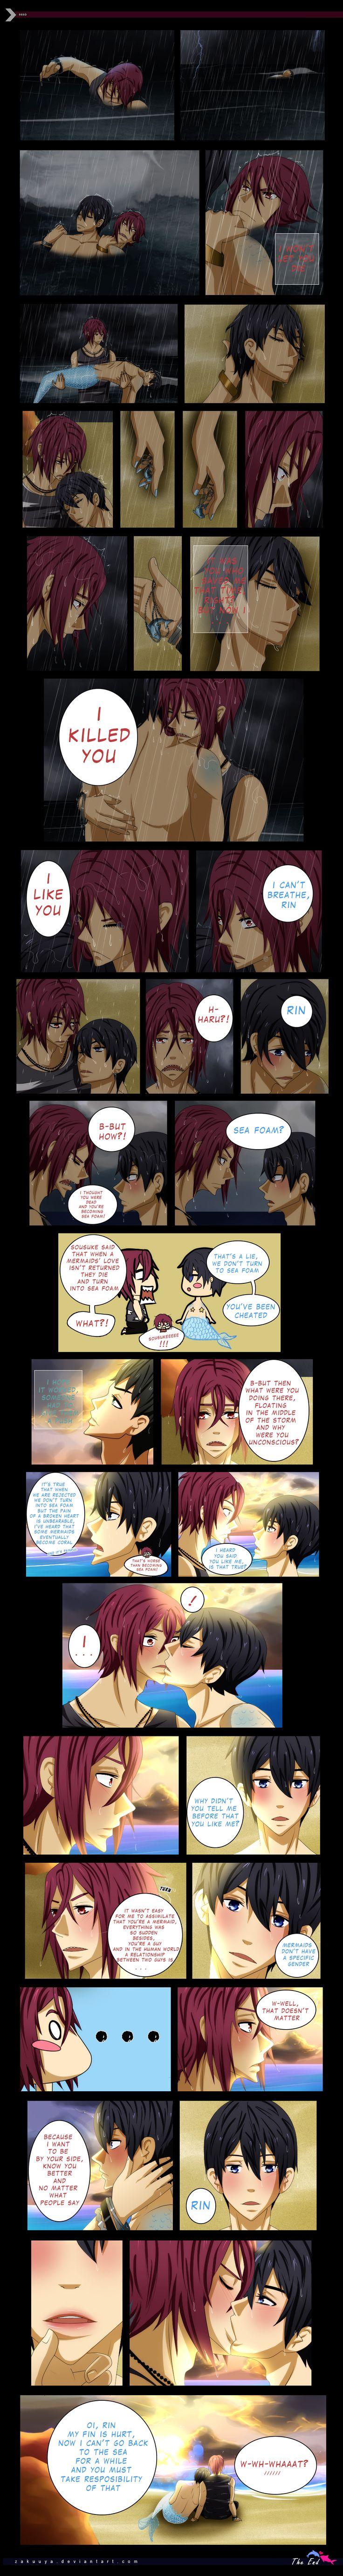 RinHaru: A Mermaid Tale 24 - THE END by Zakuuya.deviantart.com on @DeviantArt